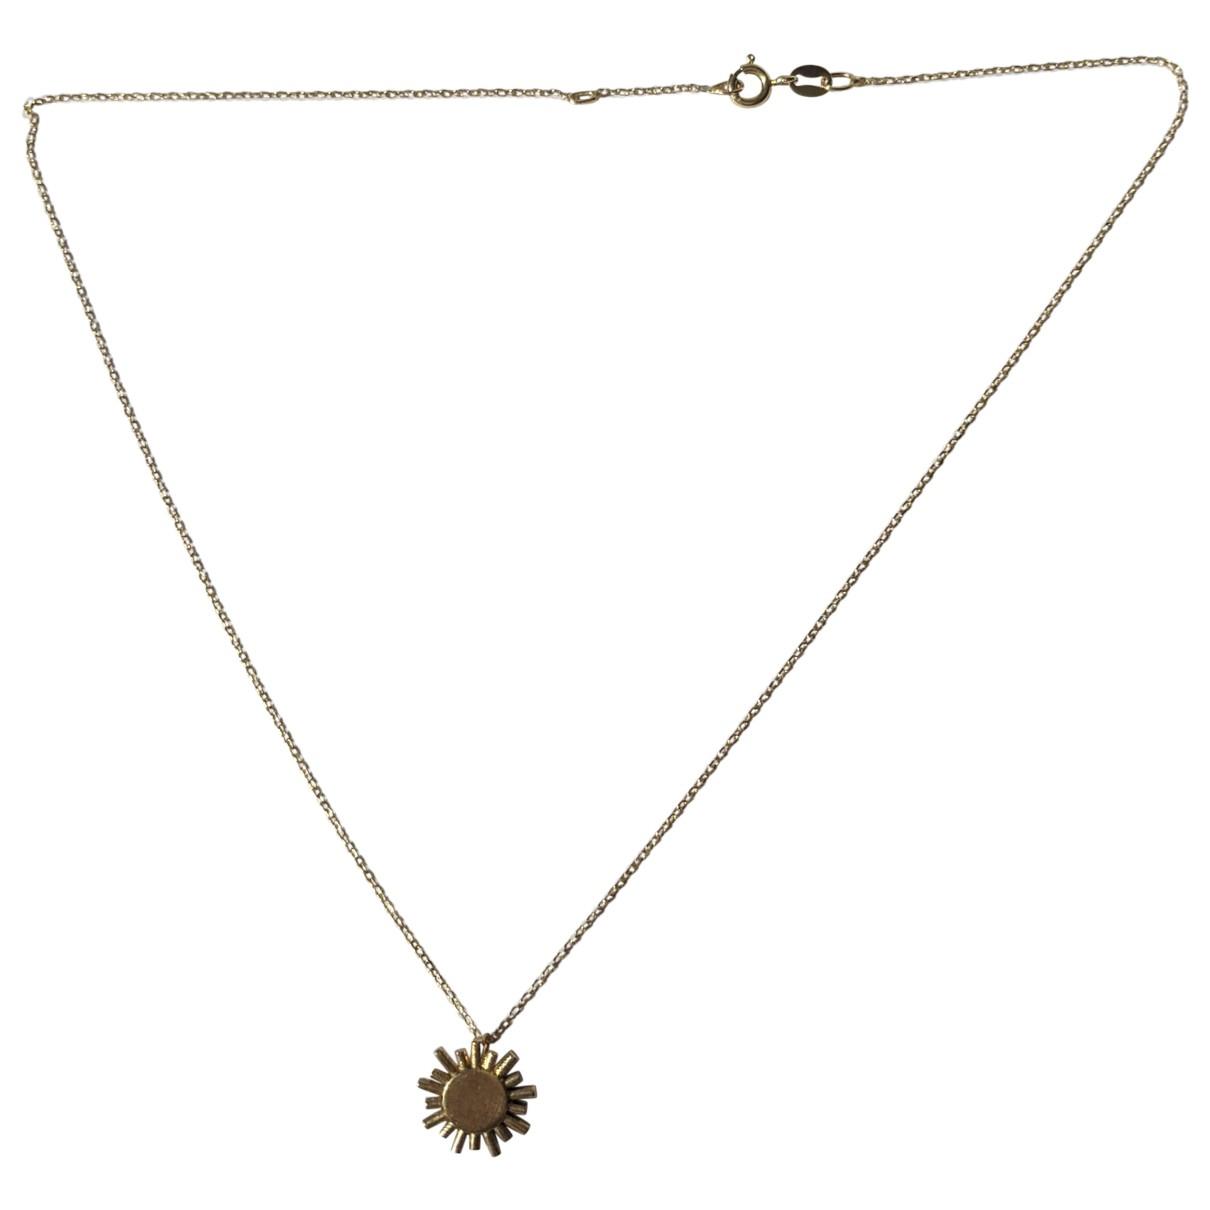 Collar de Bermellon Non Signe / Unsigned